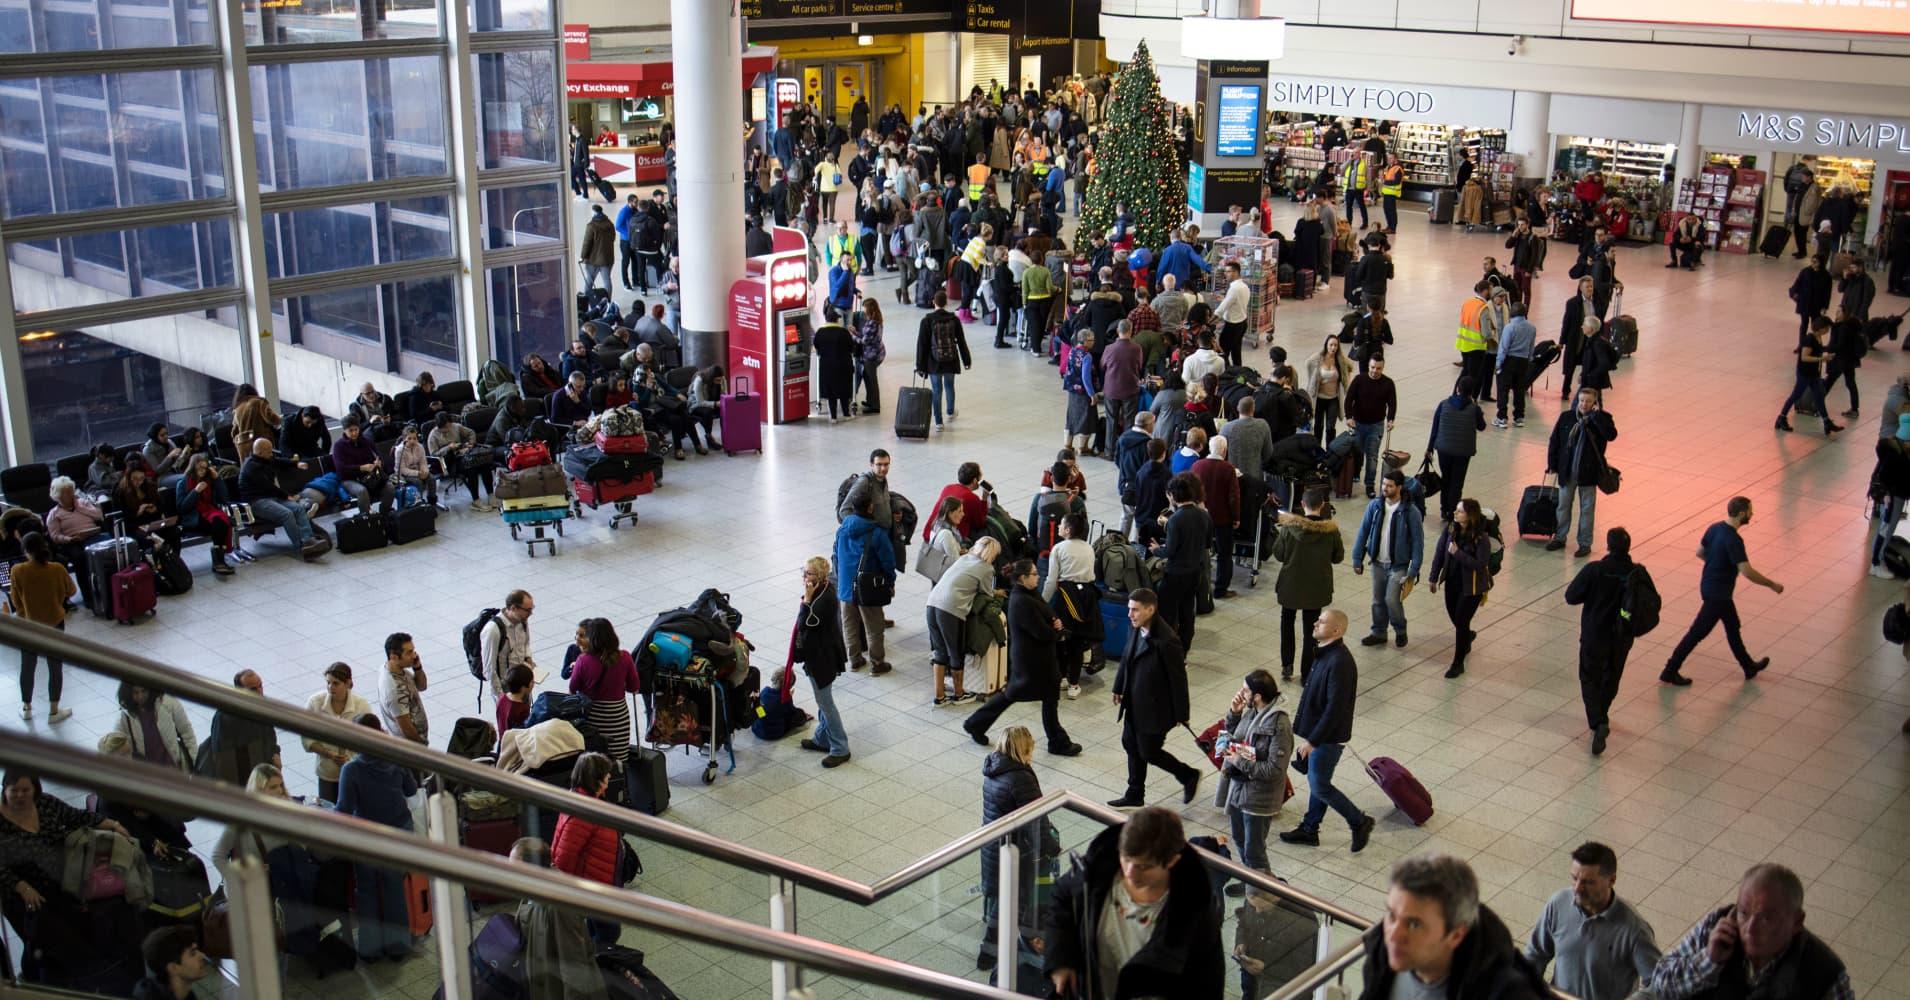 'Deliberate' drone flights shut down London Gatwick airport, stranding thousands of travelers